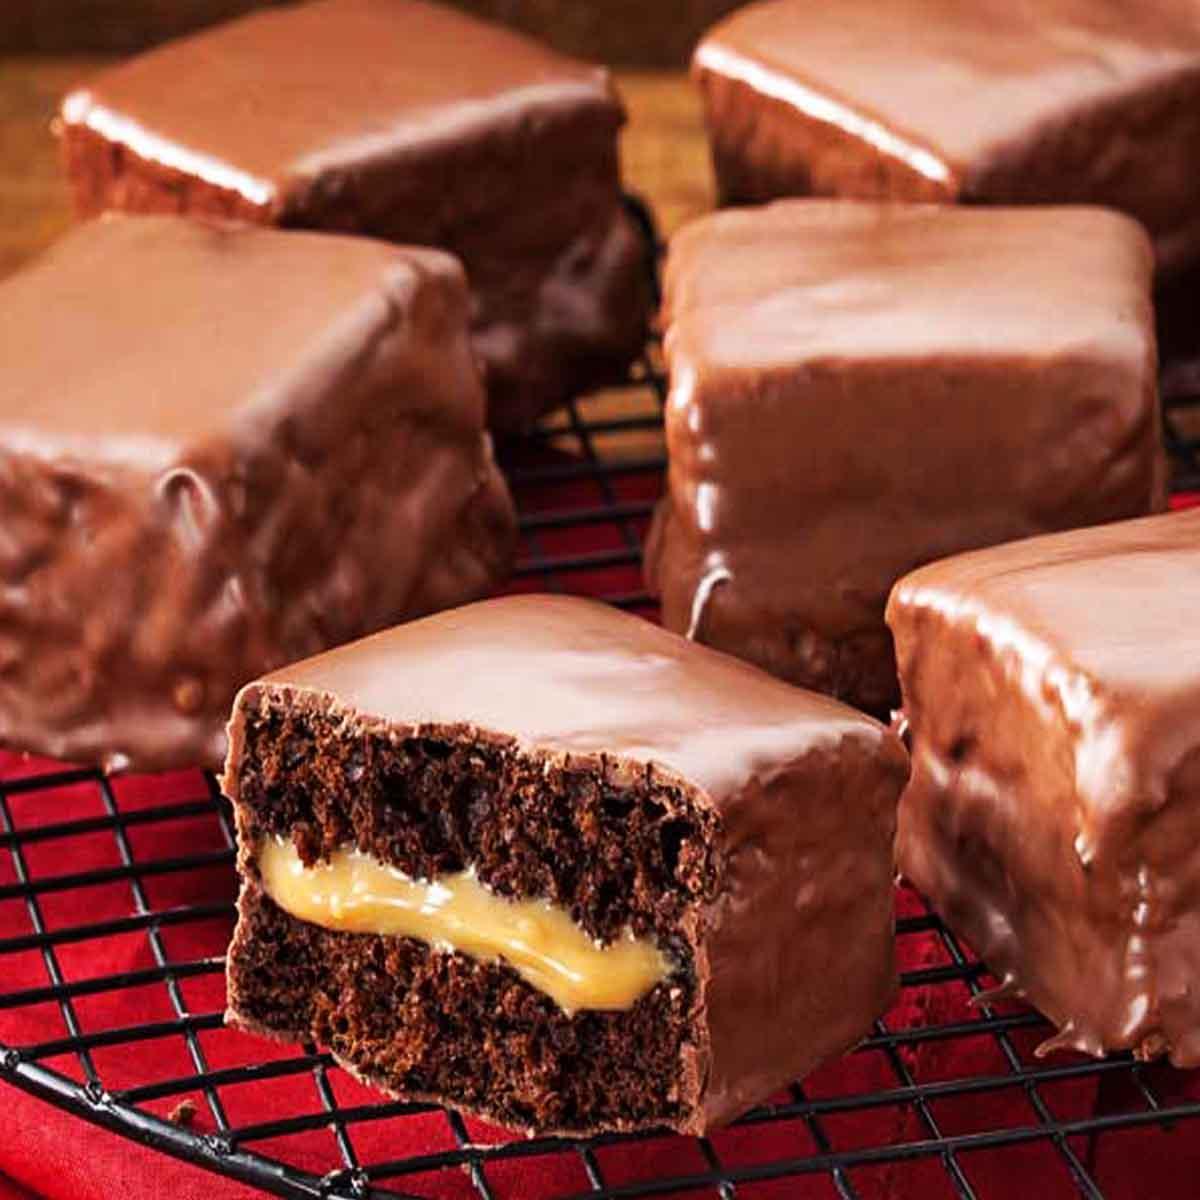 Cobertura Fracionada sabor Chocolate  Meio Amargo Gotas 2,1 kg Top Harald